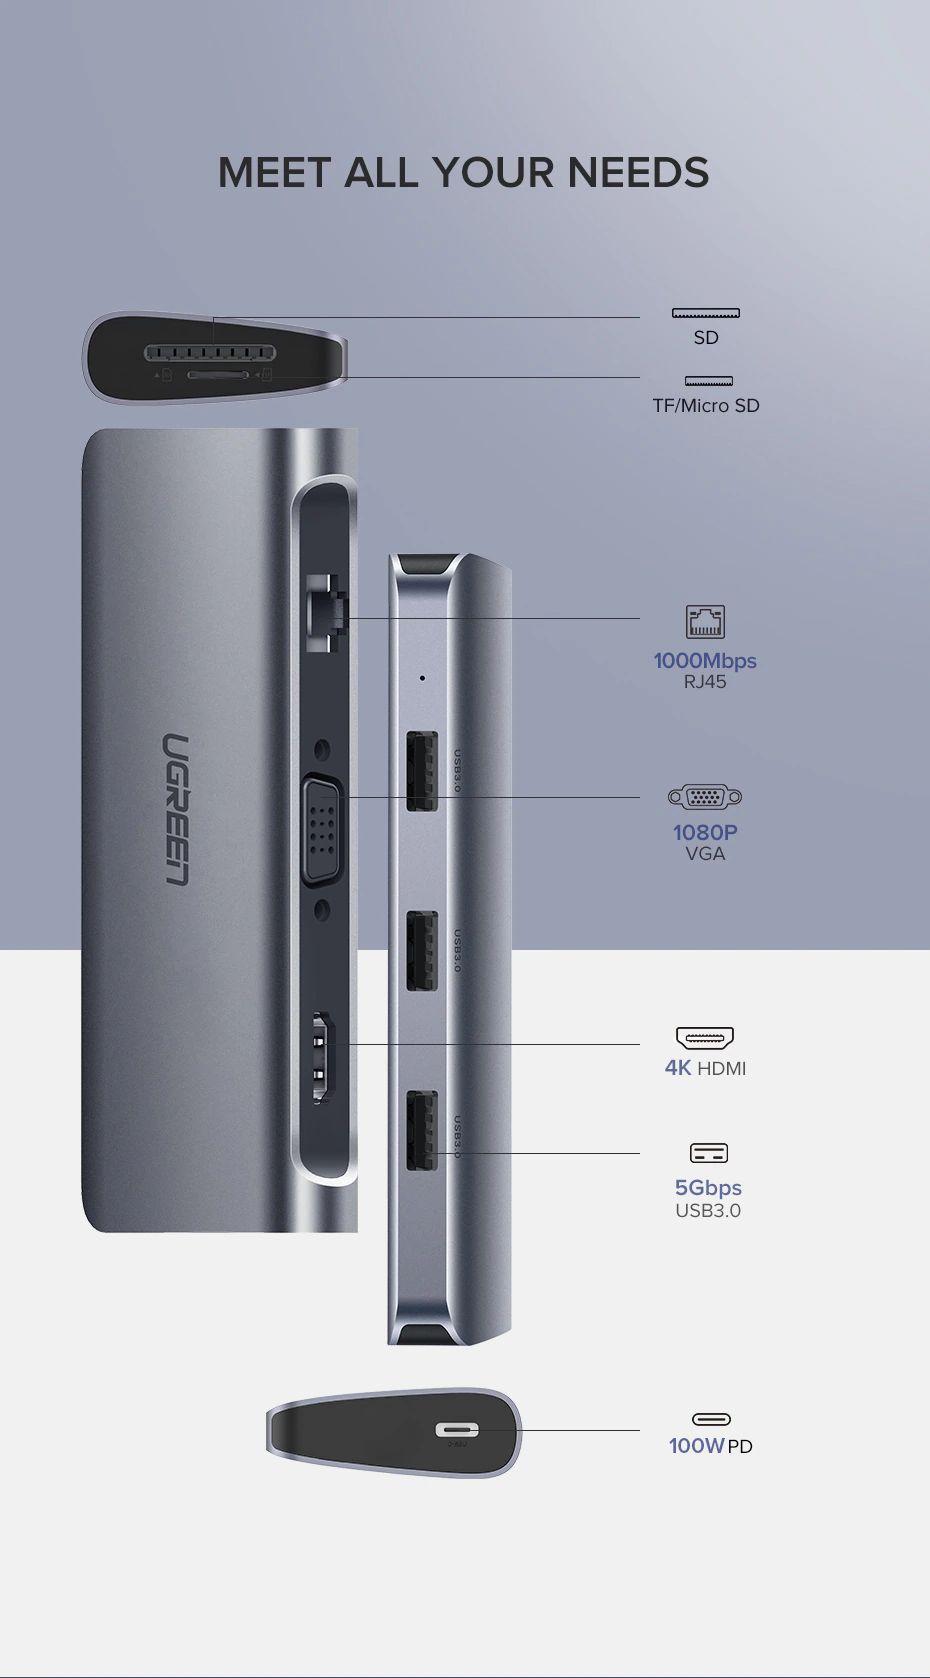 Ugreen 9 In 1 Multifunctional Usb C Hub Adapter (9)